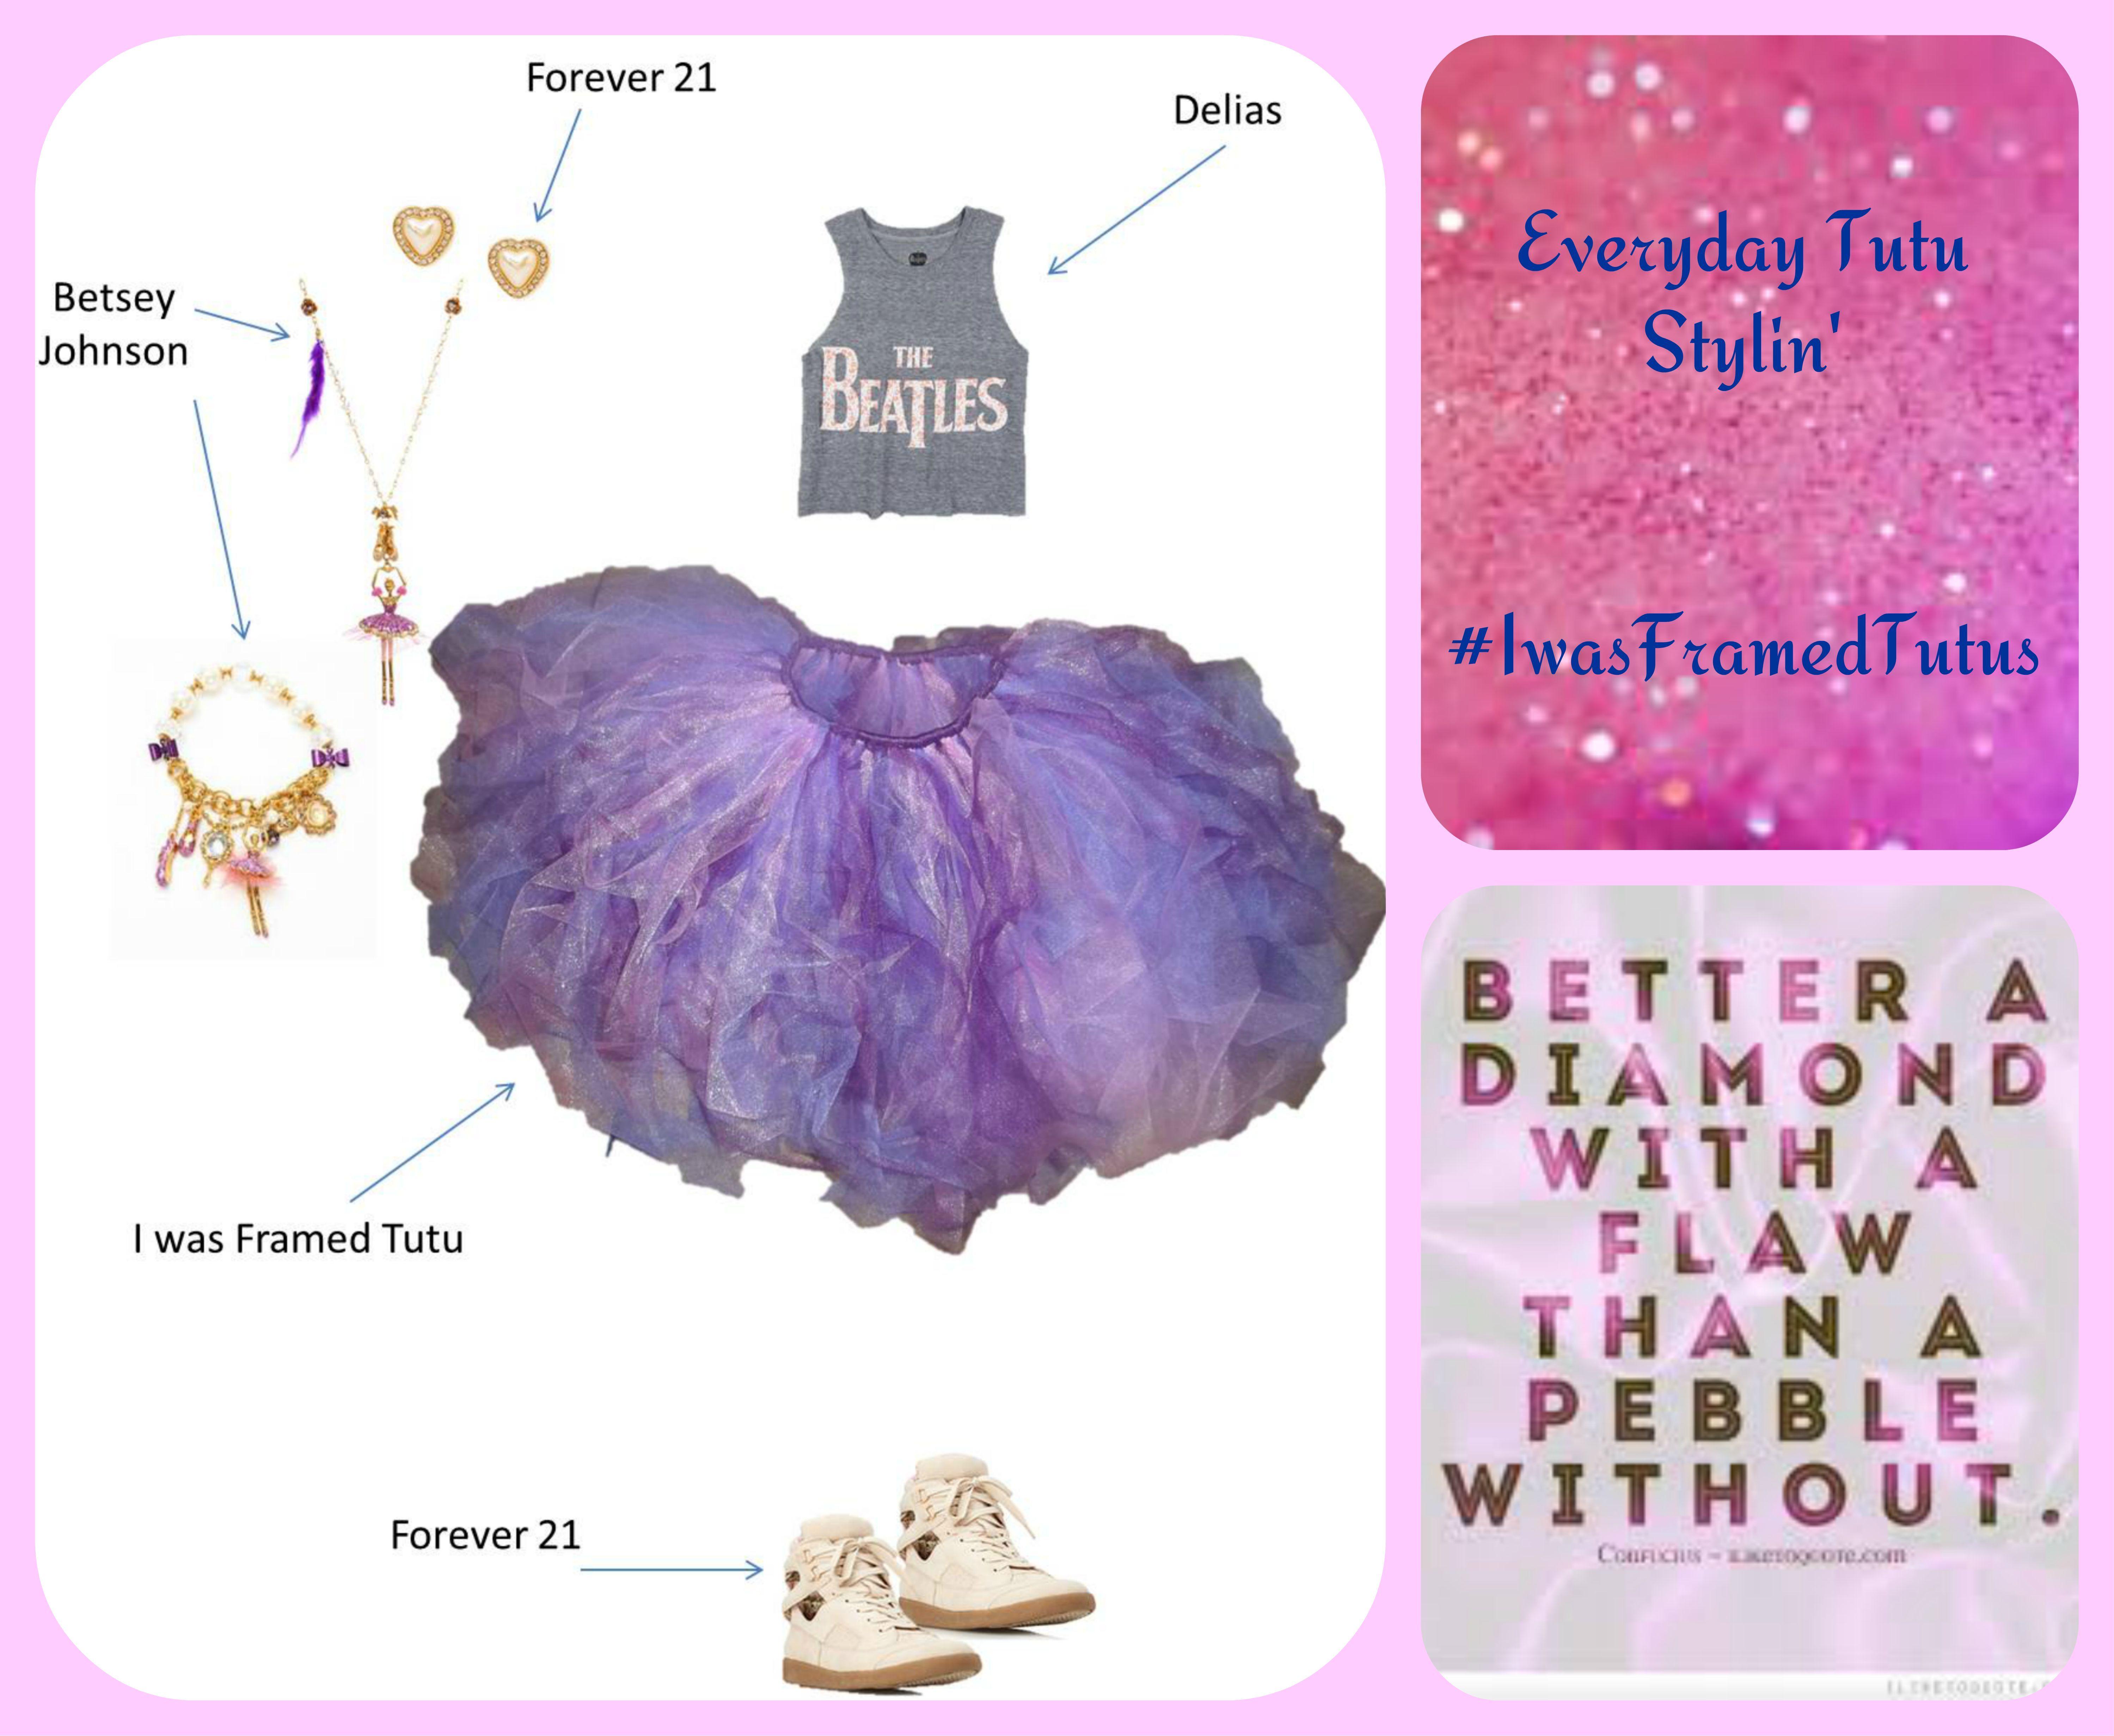 Everyday Tutu Stylin\' w/ I was Framed Tutu Lavender, Pink, and Plum ...